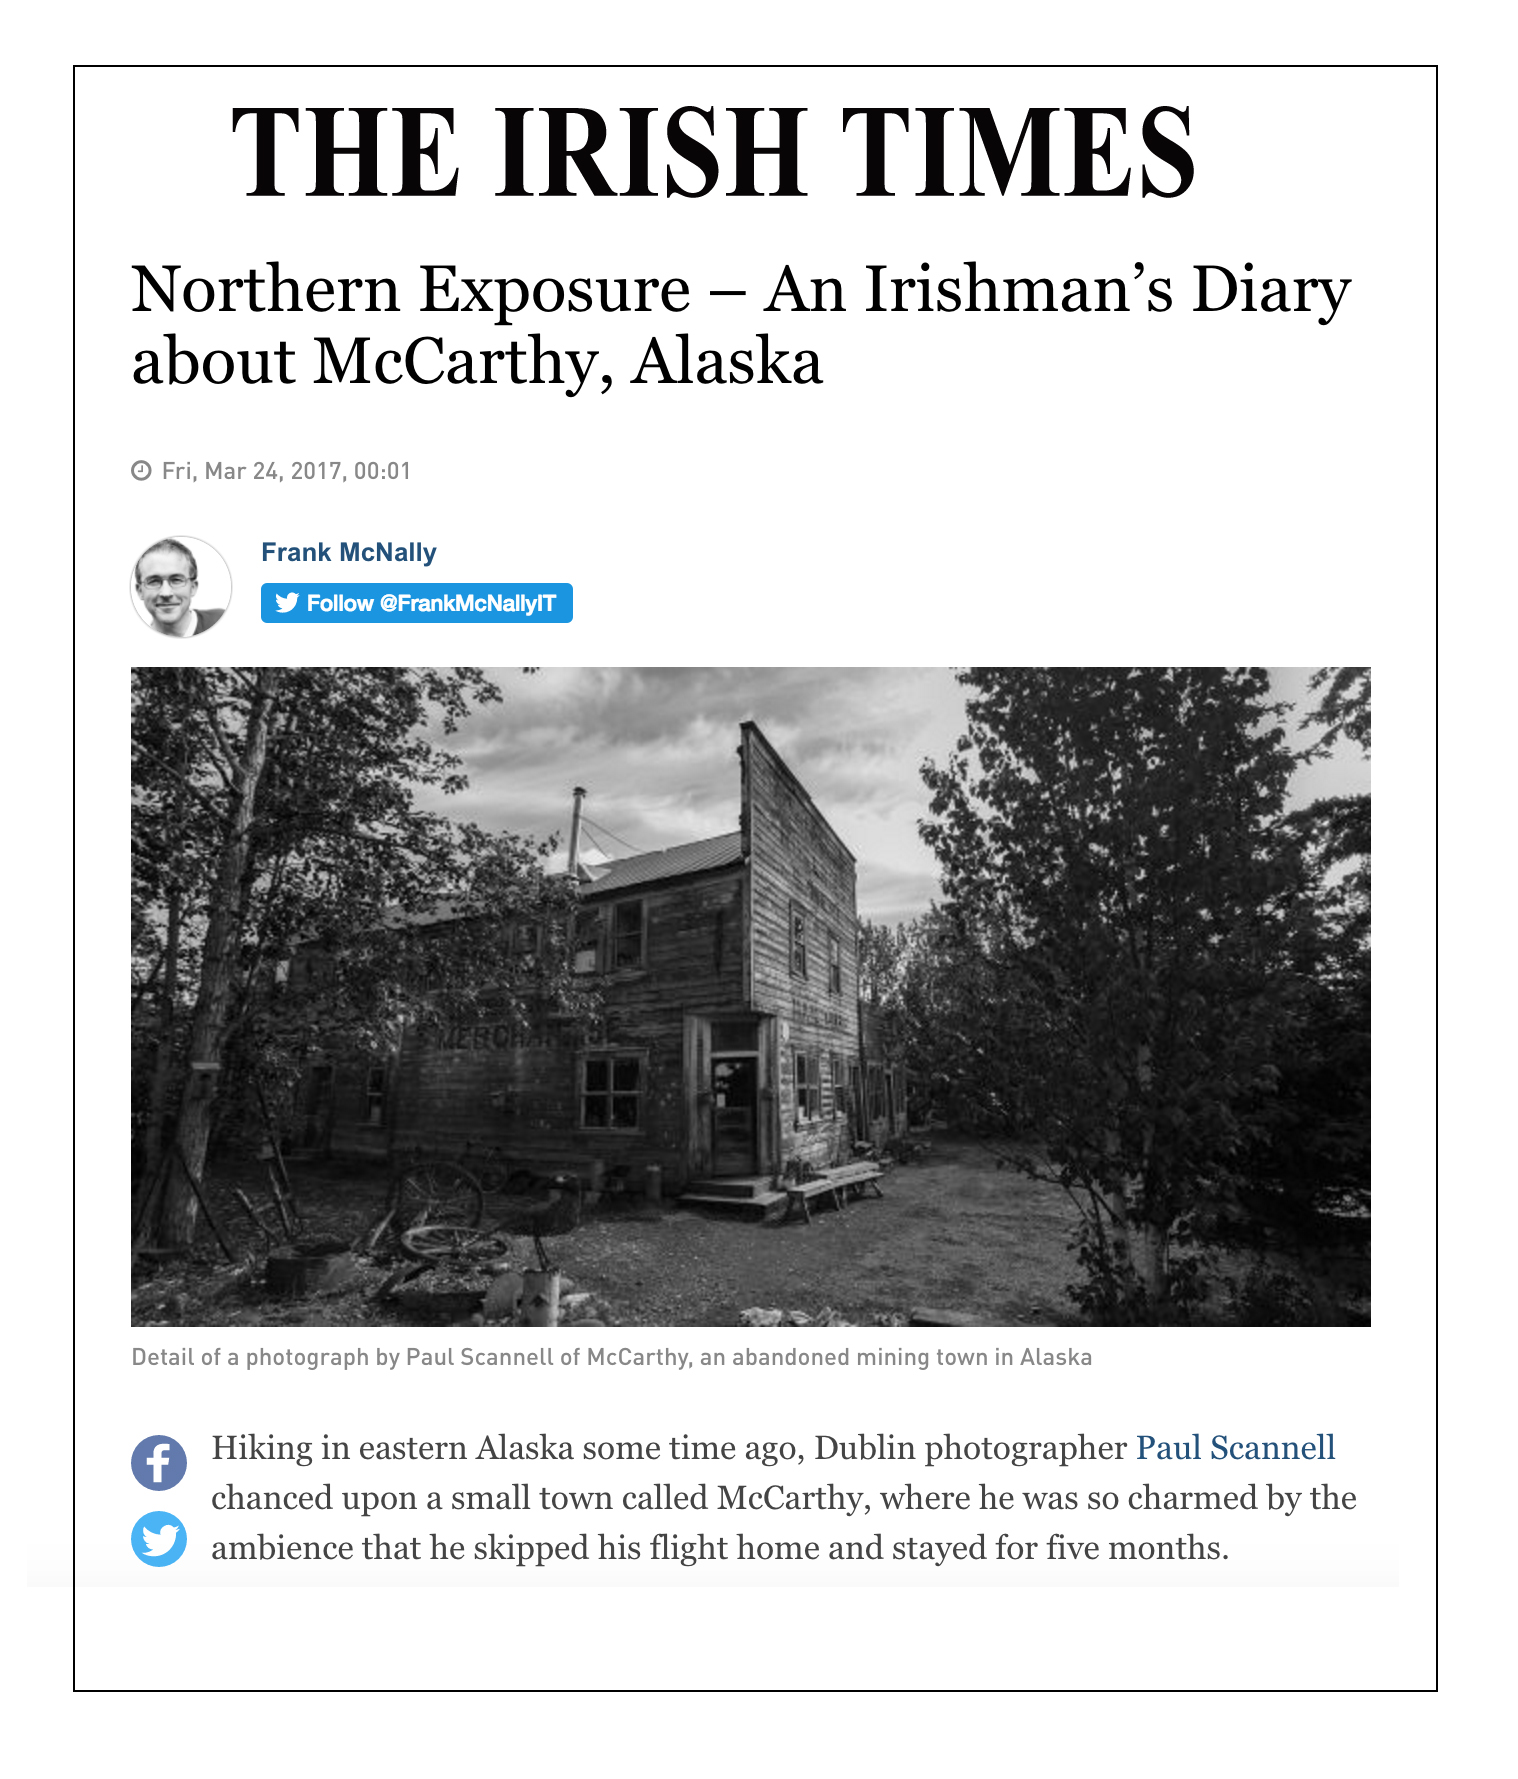 https://www.irishtimes.com/opinion/northern-exposure-an-irishman-s-diary-about-mccarthy-alaska-1.3022294